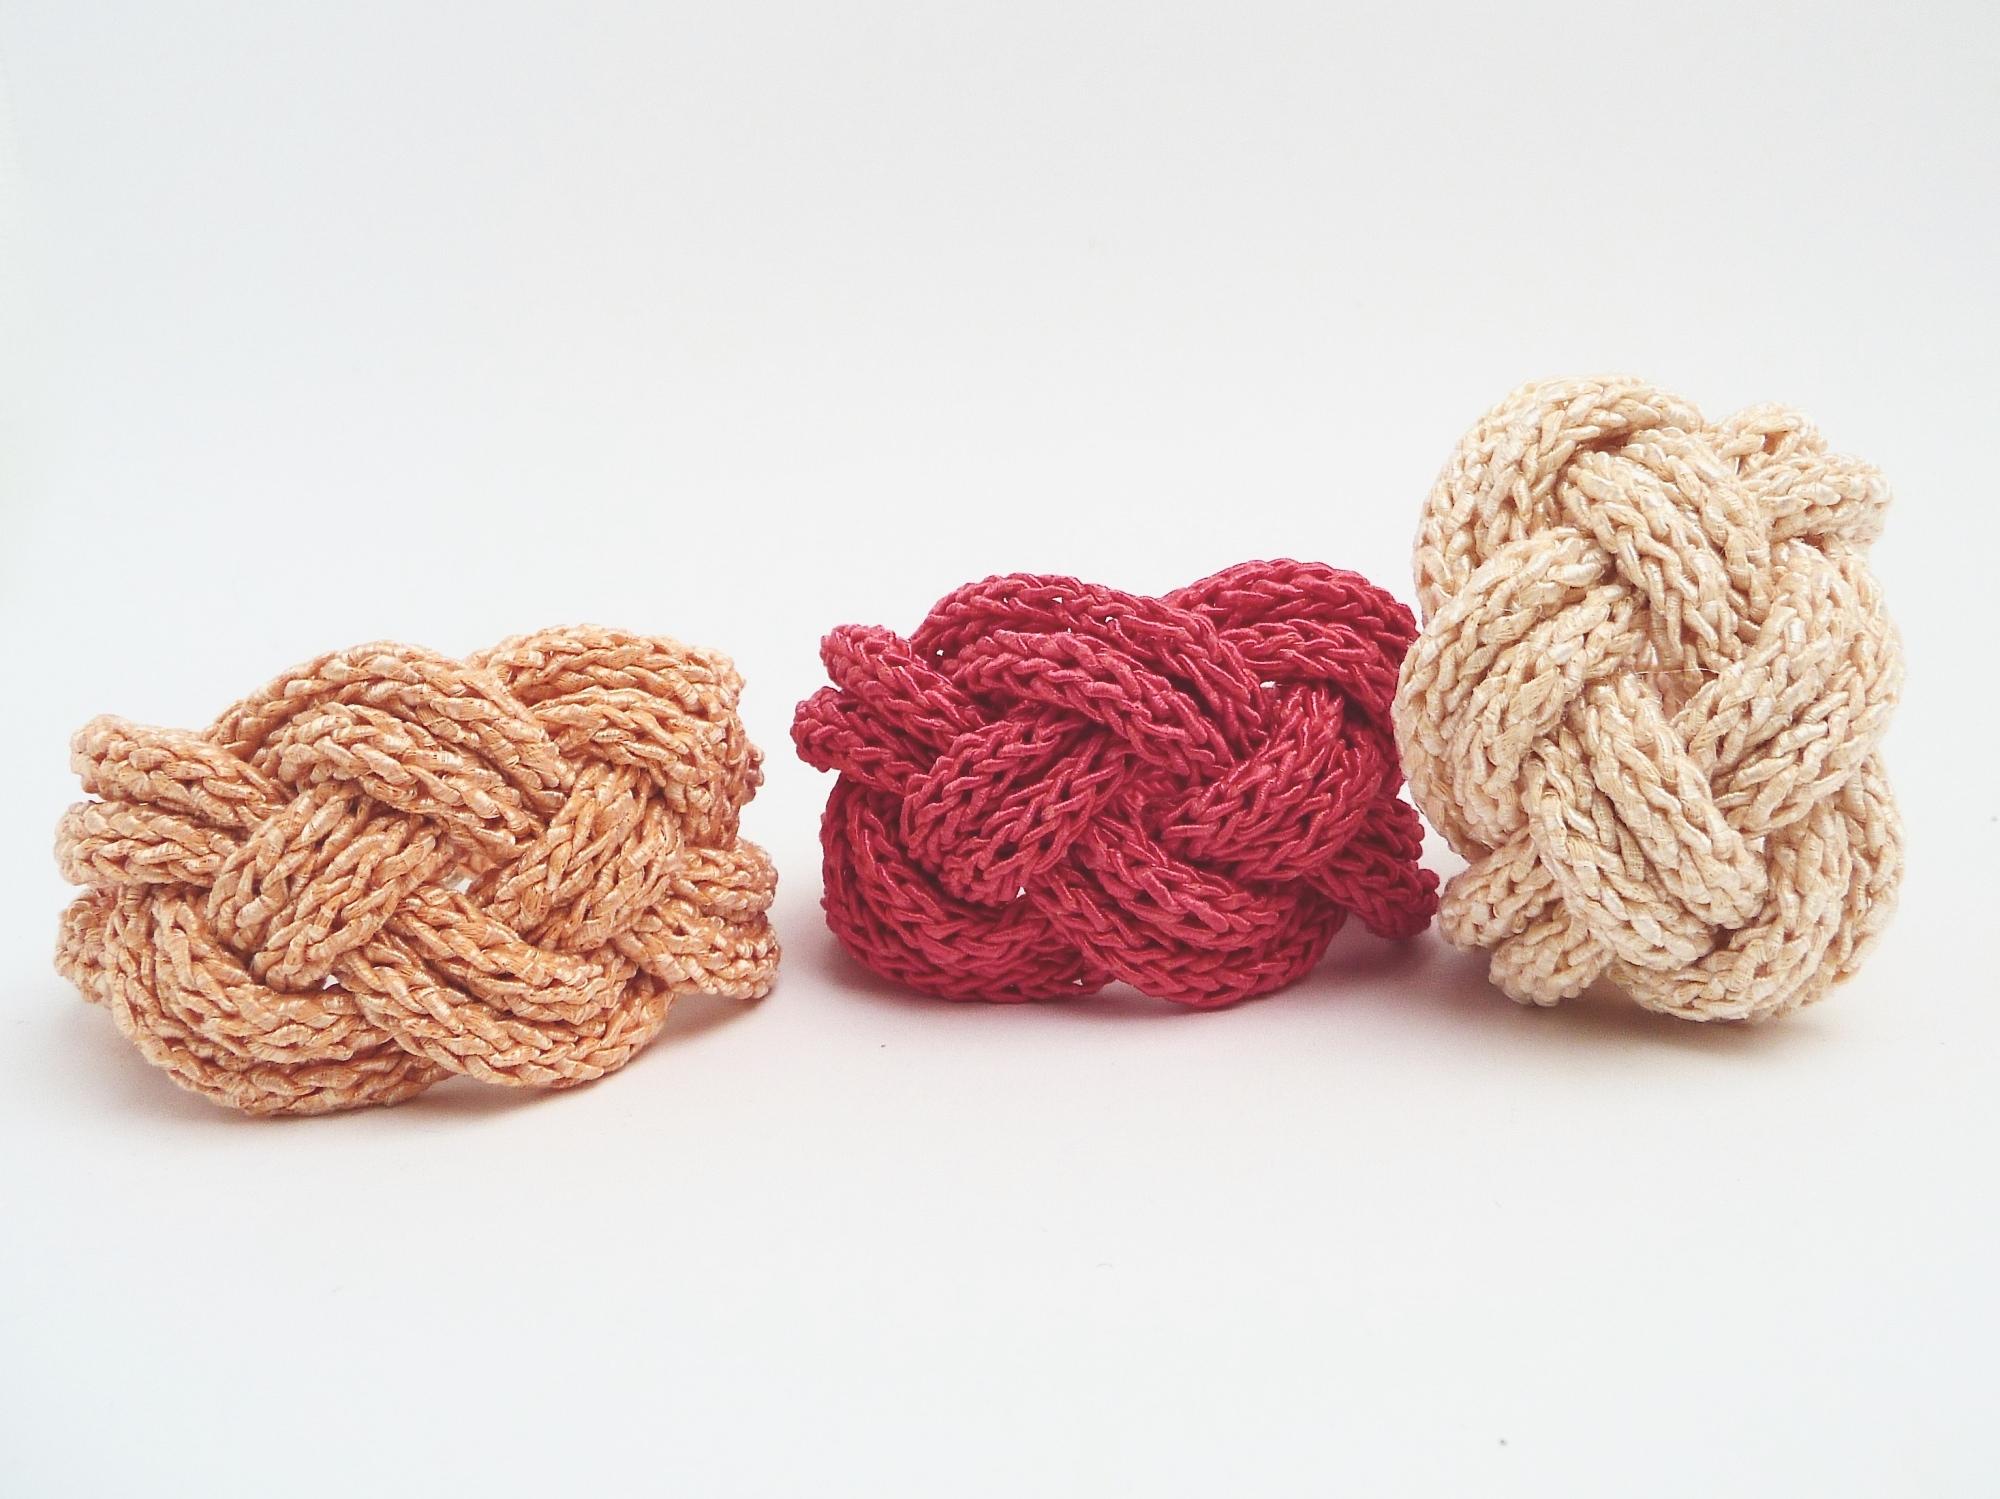 - Armband Pastell Lachs Keltischer Knoten Seide Cotton Strick Armreif - Armband Pastell Lachs Keltischer Knoten Seide Cotton Strick Armreif